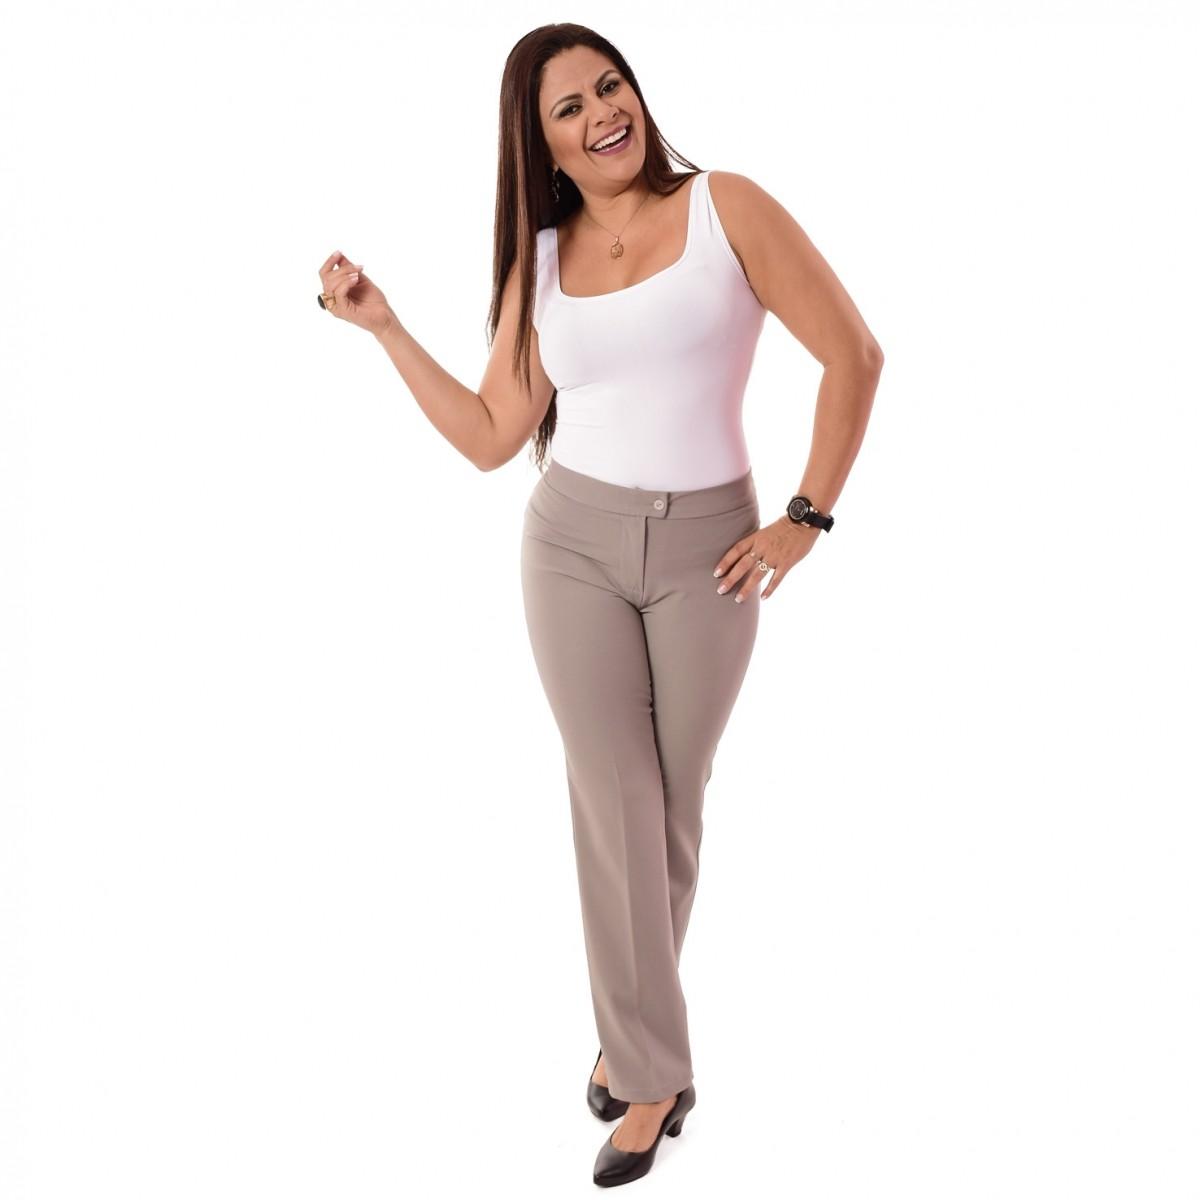 Calça Social Feminina Longa - Cores Diversas